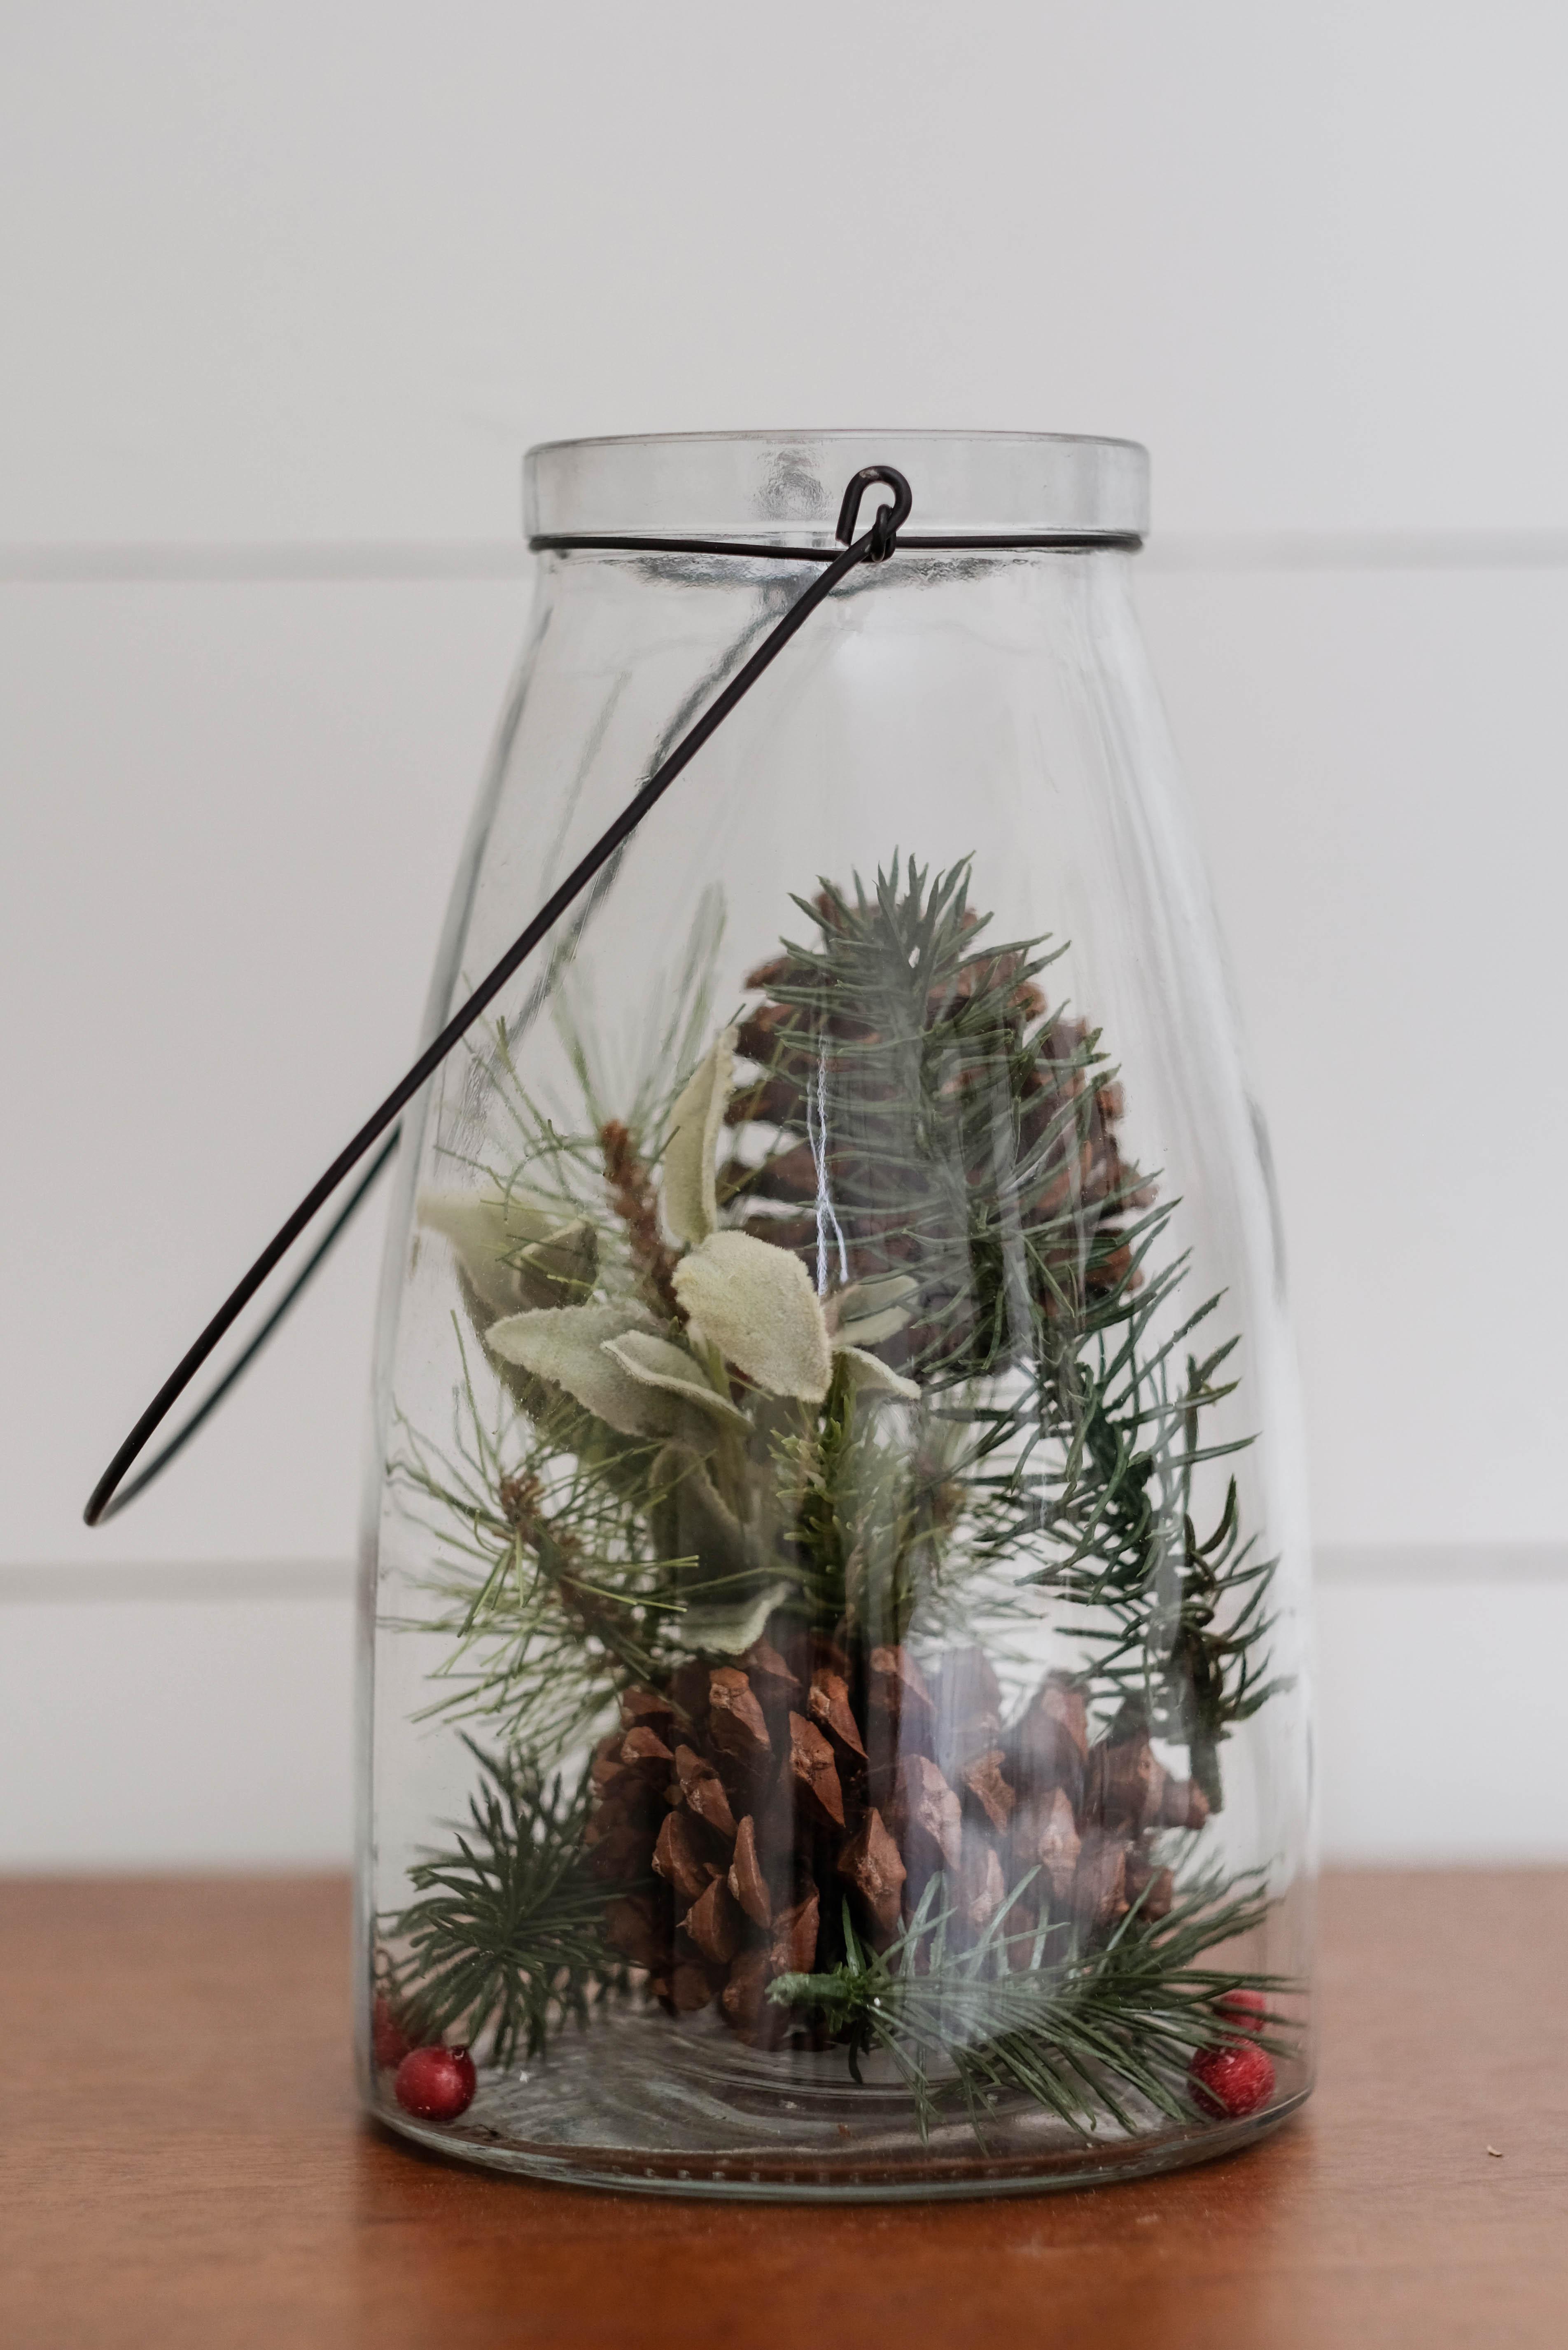 Simple Christmas Decor Ideas - 3 Ways to Fill a Lantern for Christmas